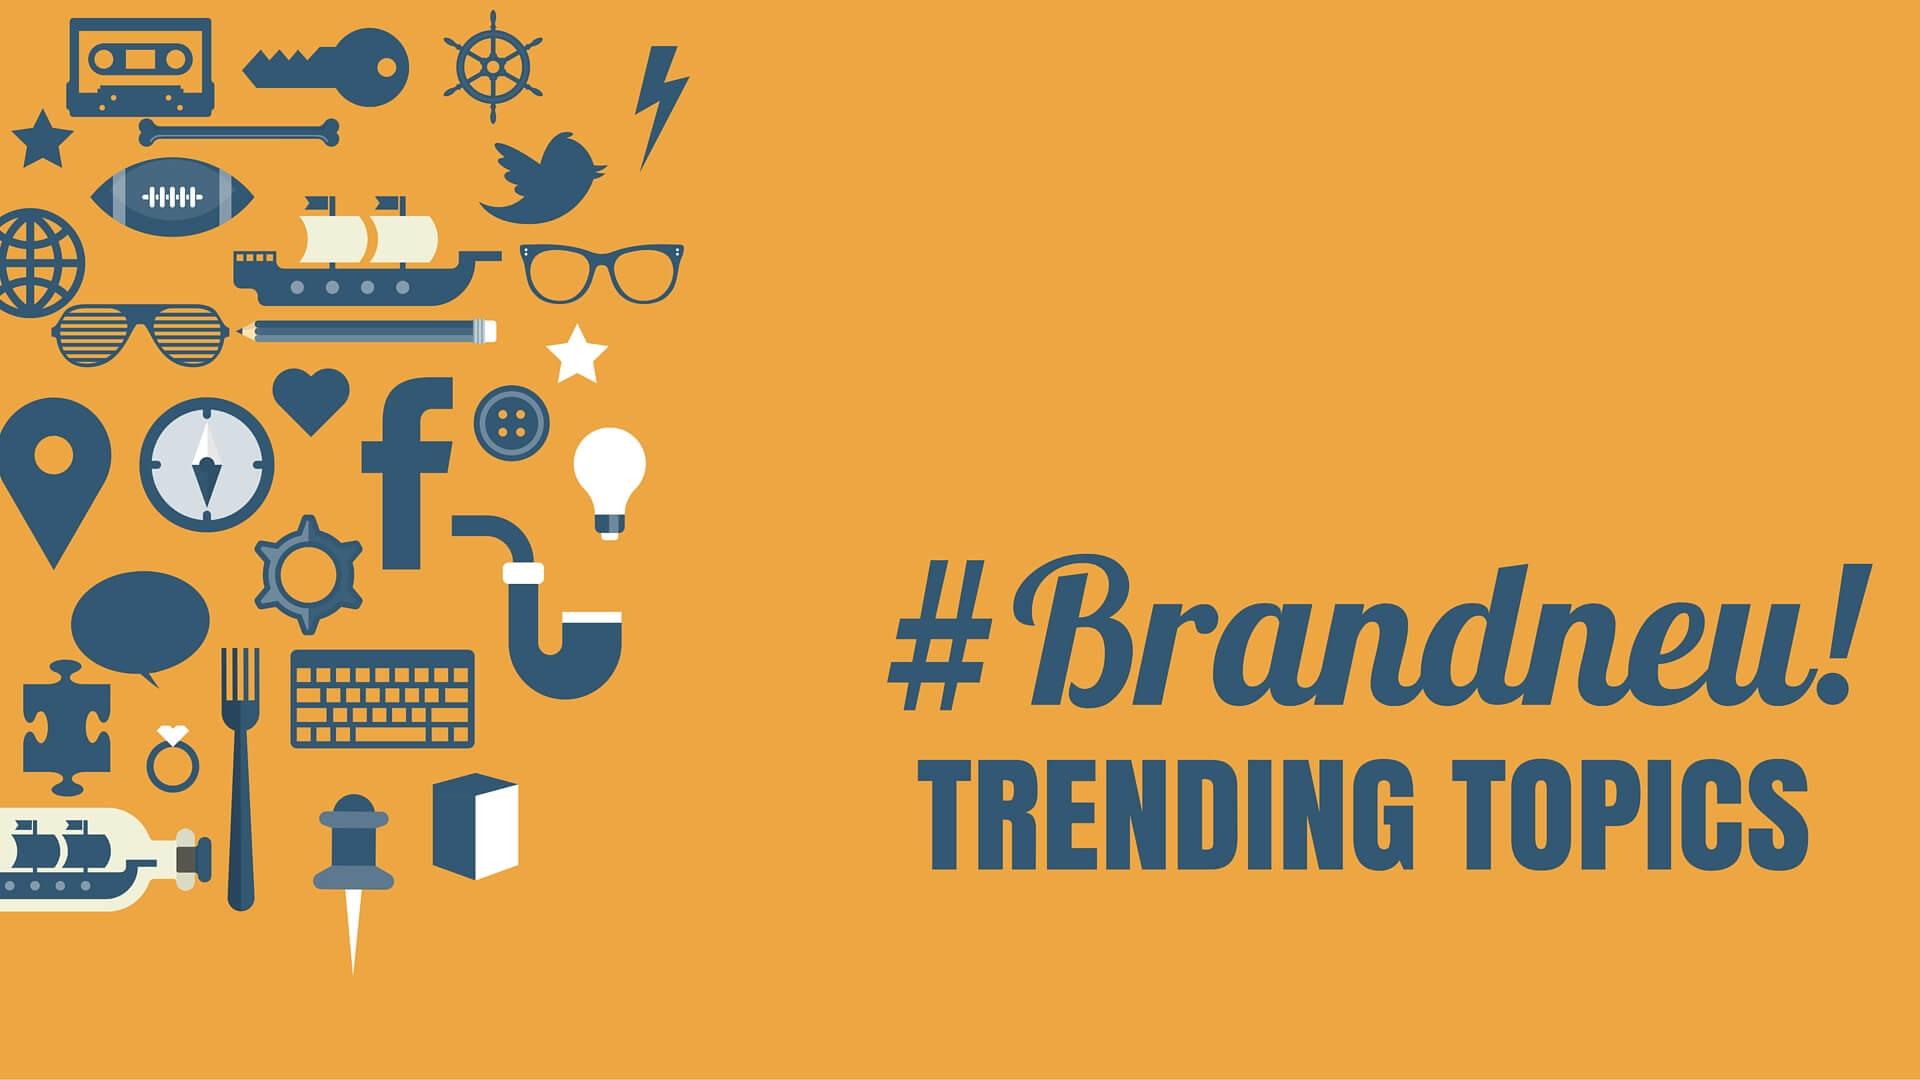 Trending-topics.jpg